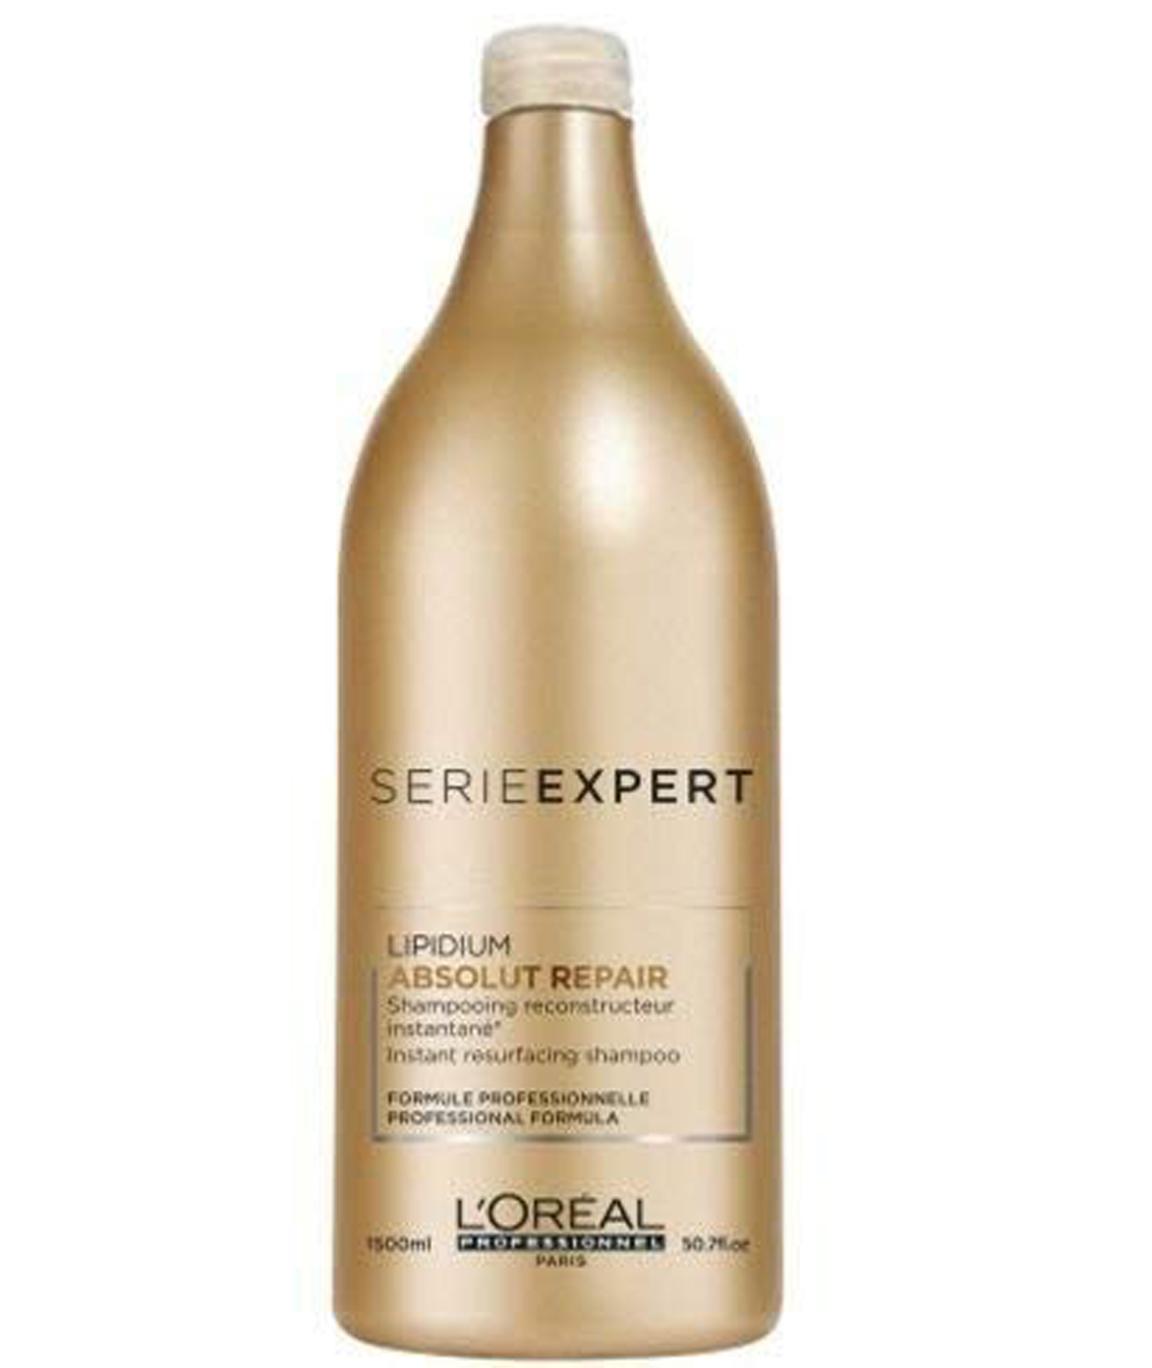 L`Oreal Paris Professionnel Expert Serie - Absolut Repair Lipidium Instant Resurfacing Shampoo for Very Damaged Hair, 1500ml/50.7oz